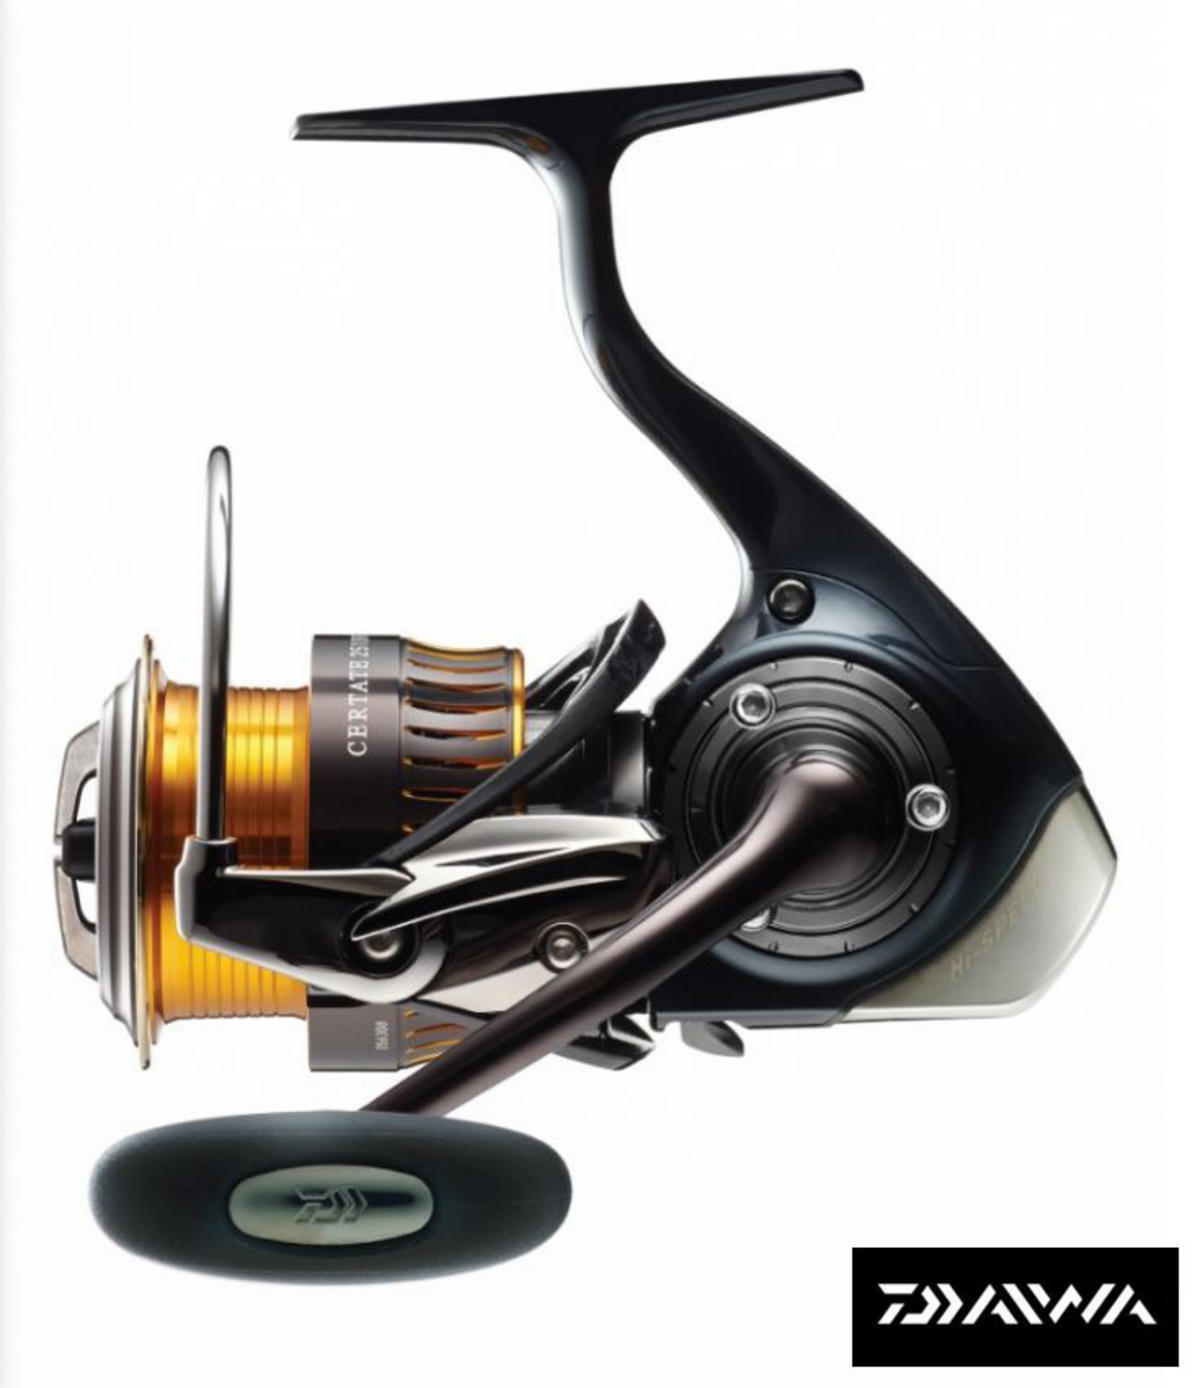 New Daiwa 16 Certate 2510RPE-H Spinning Reel Model No. 16Certate 2510RPE-H